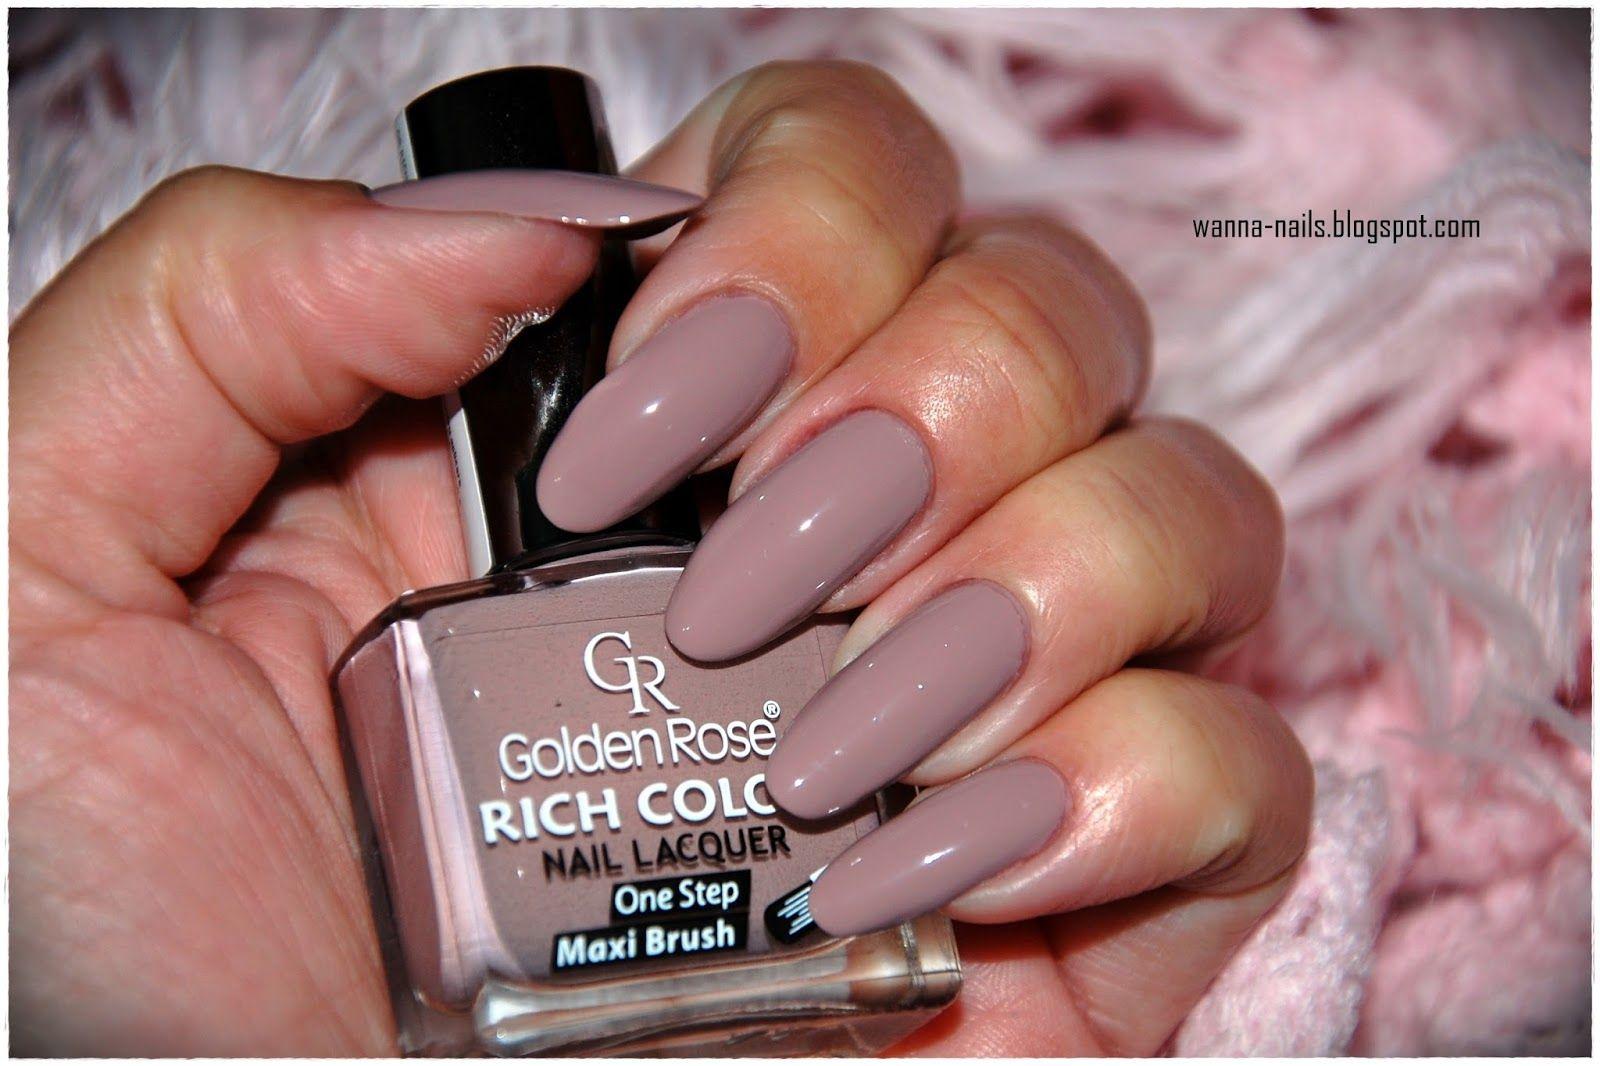 Golden Rose Rich Color 05 Wanna See My Nails Kalpli Oje Oje Fikirleri Mucevherli Tirnaklar